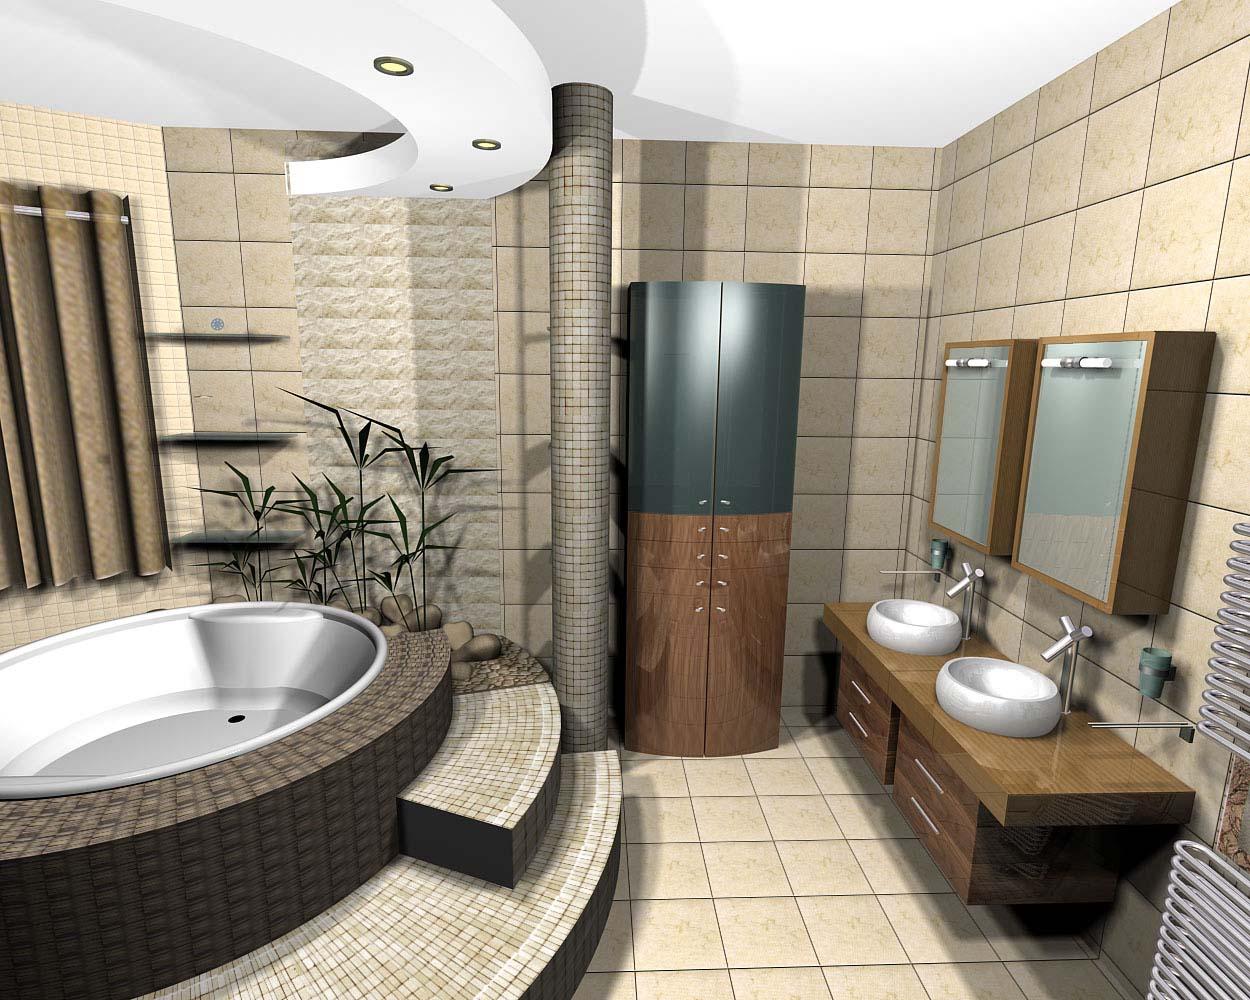 Effective-Bathroom-Furniture Simple and effective bathroom design